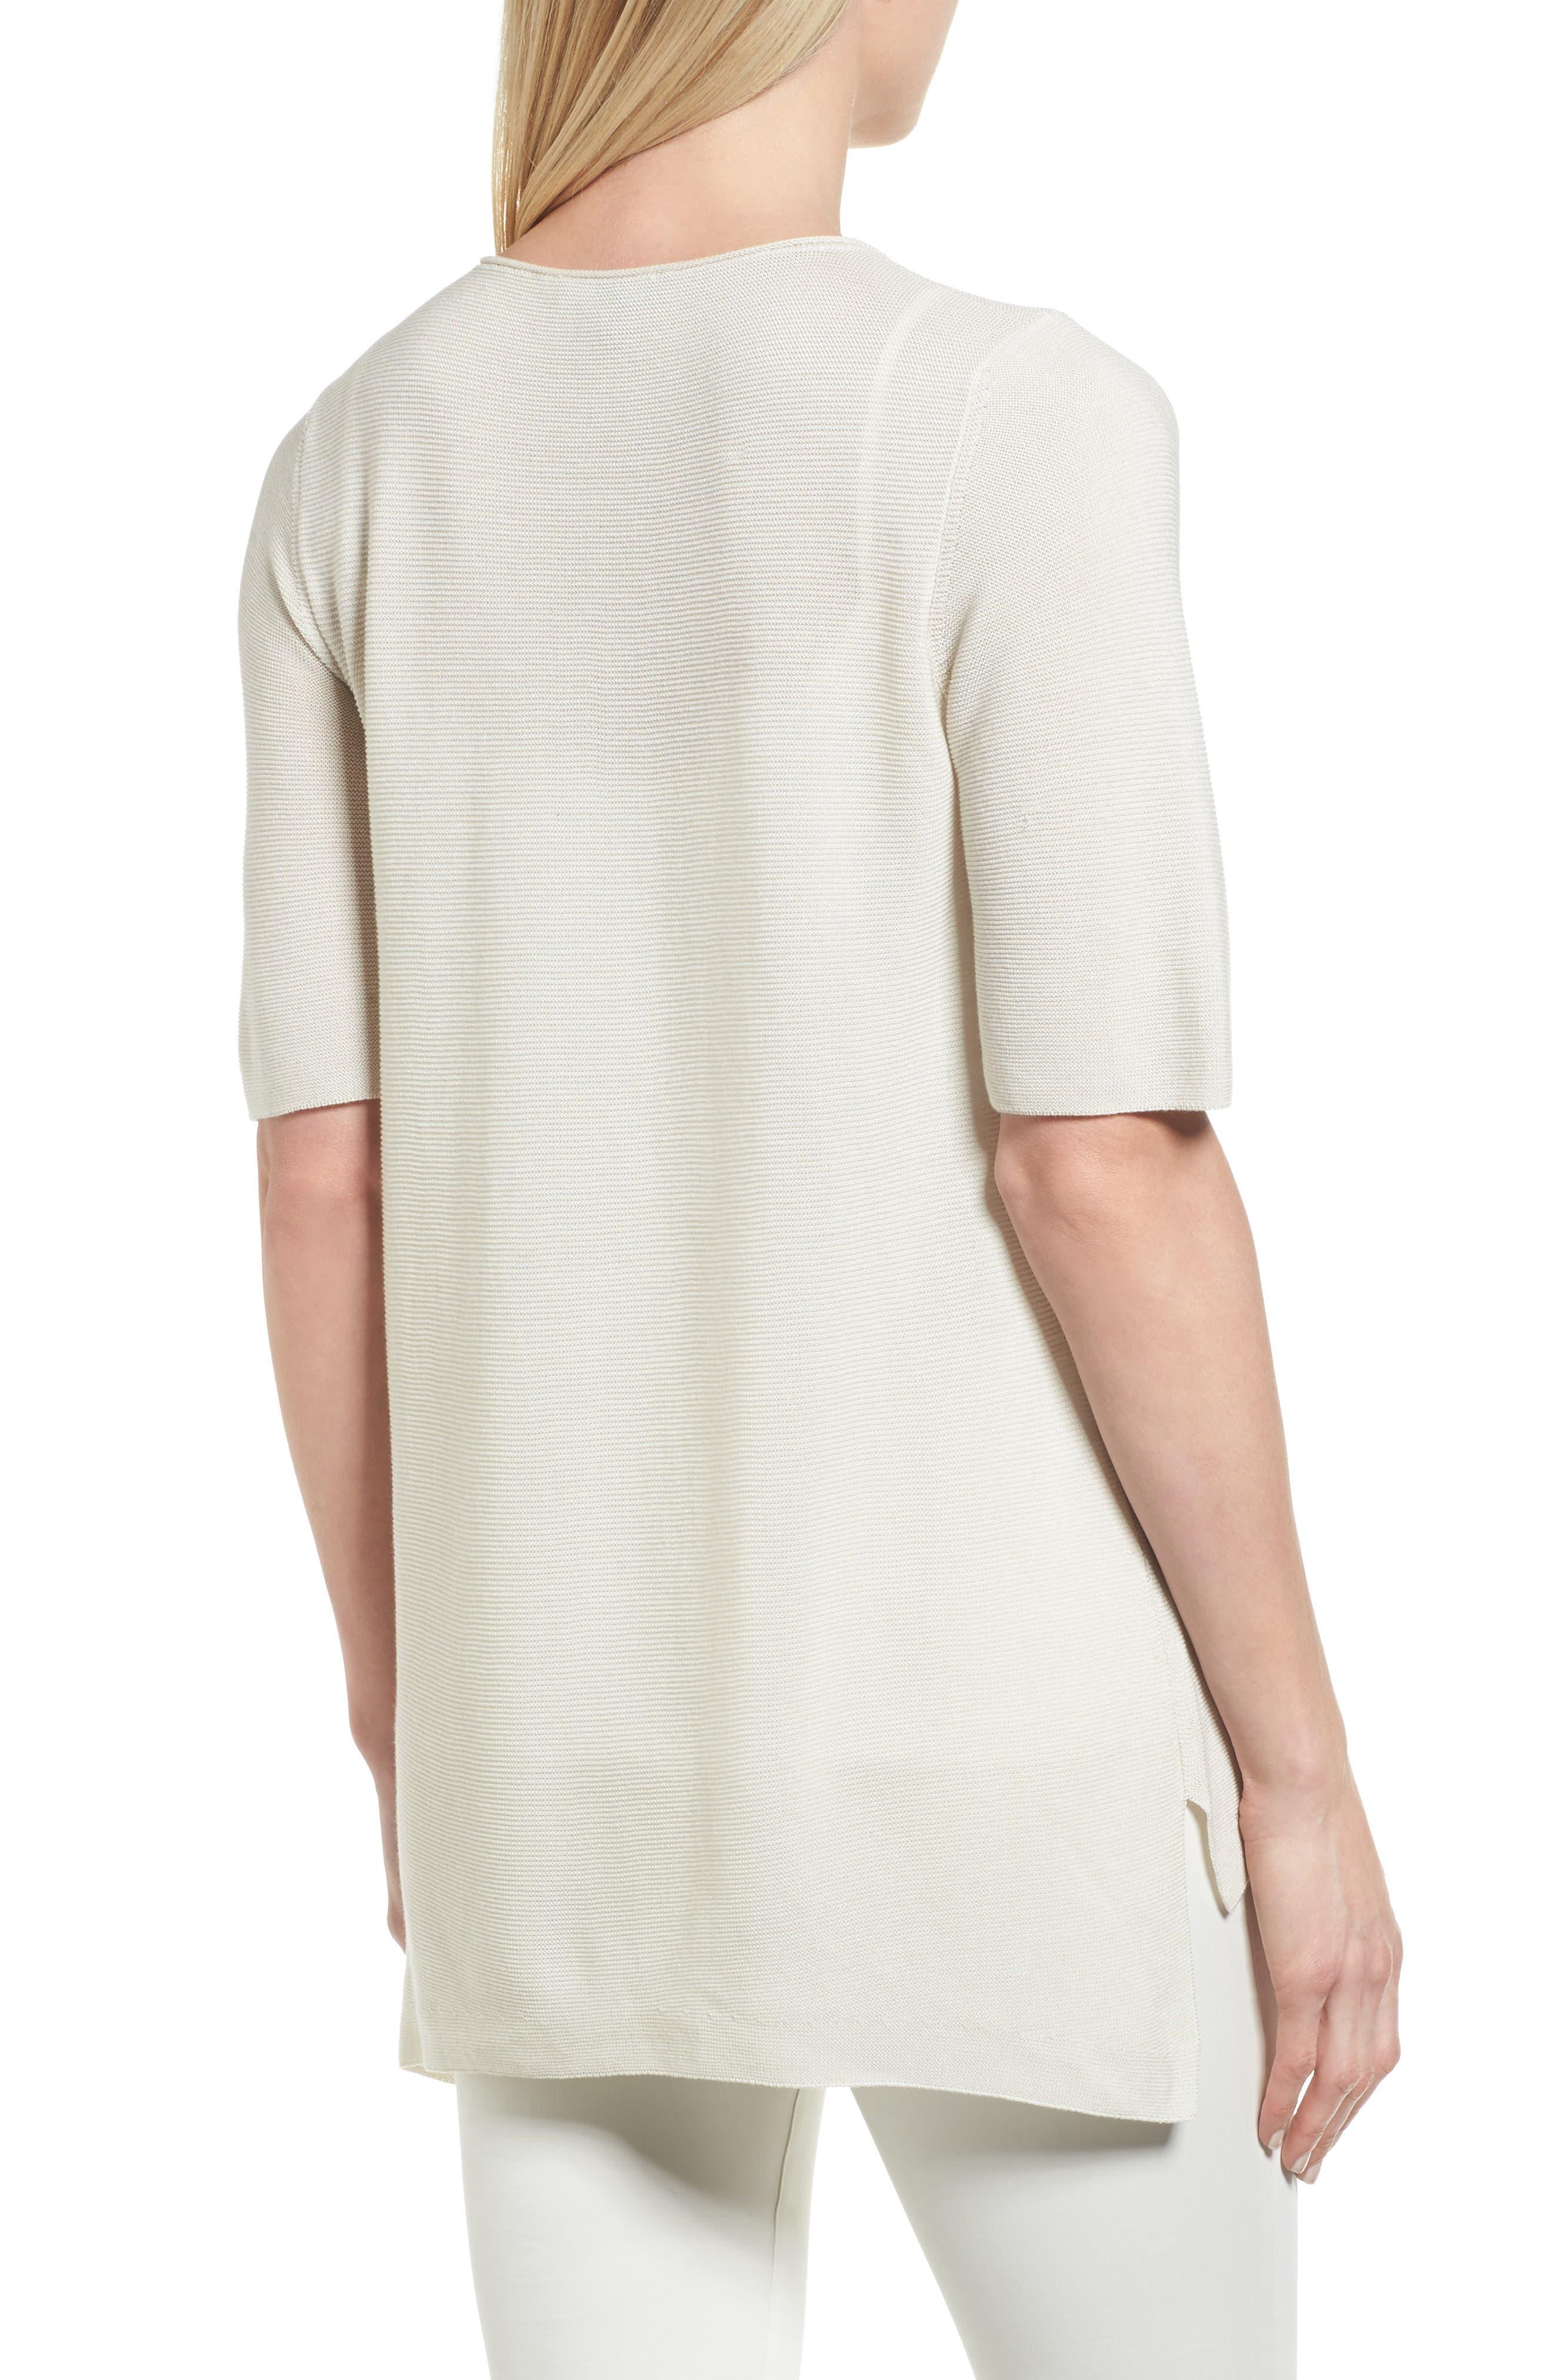 Alternate Image 2  - Eileen Fisher Tencel® Knit Top (Regular & Petite)